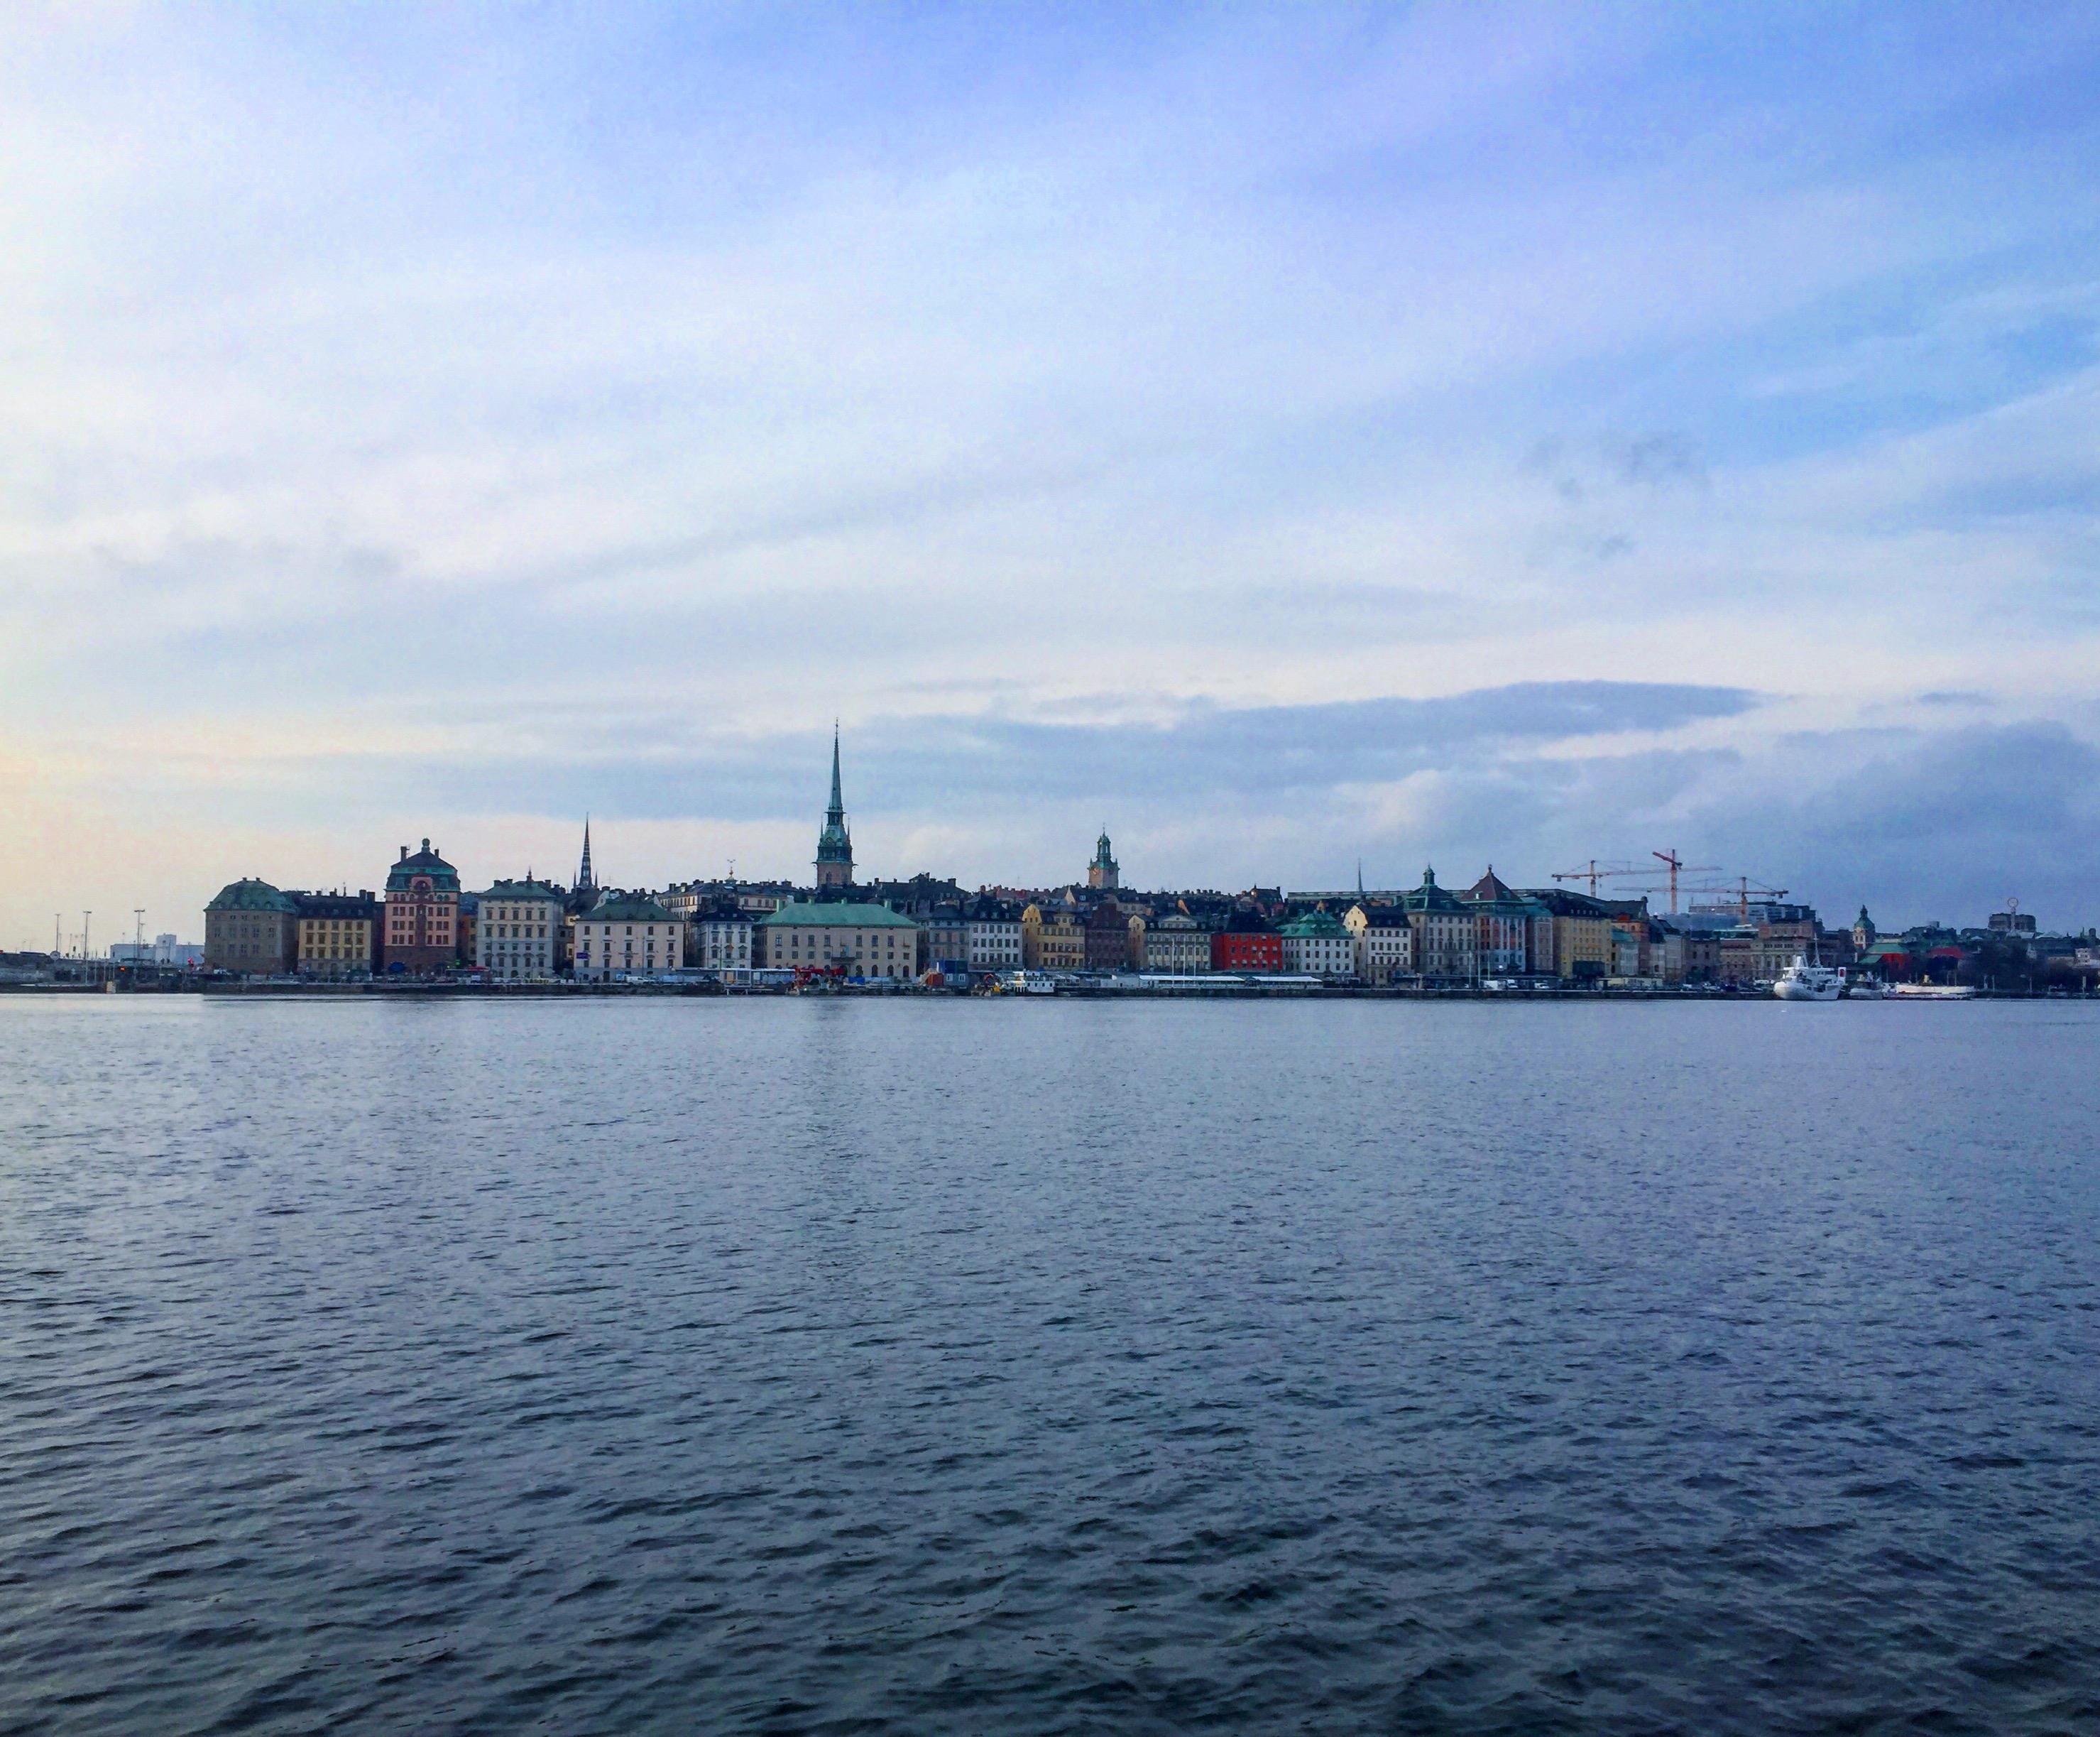 stockholm view, water view stockholm, stockholm boat view, stockholm city, visit stockholm